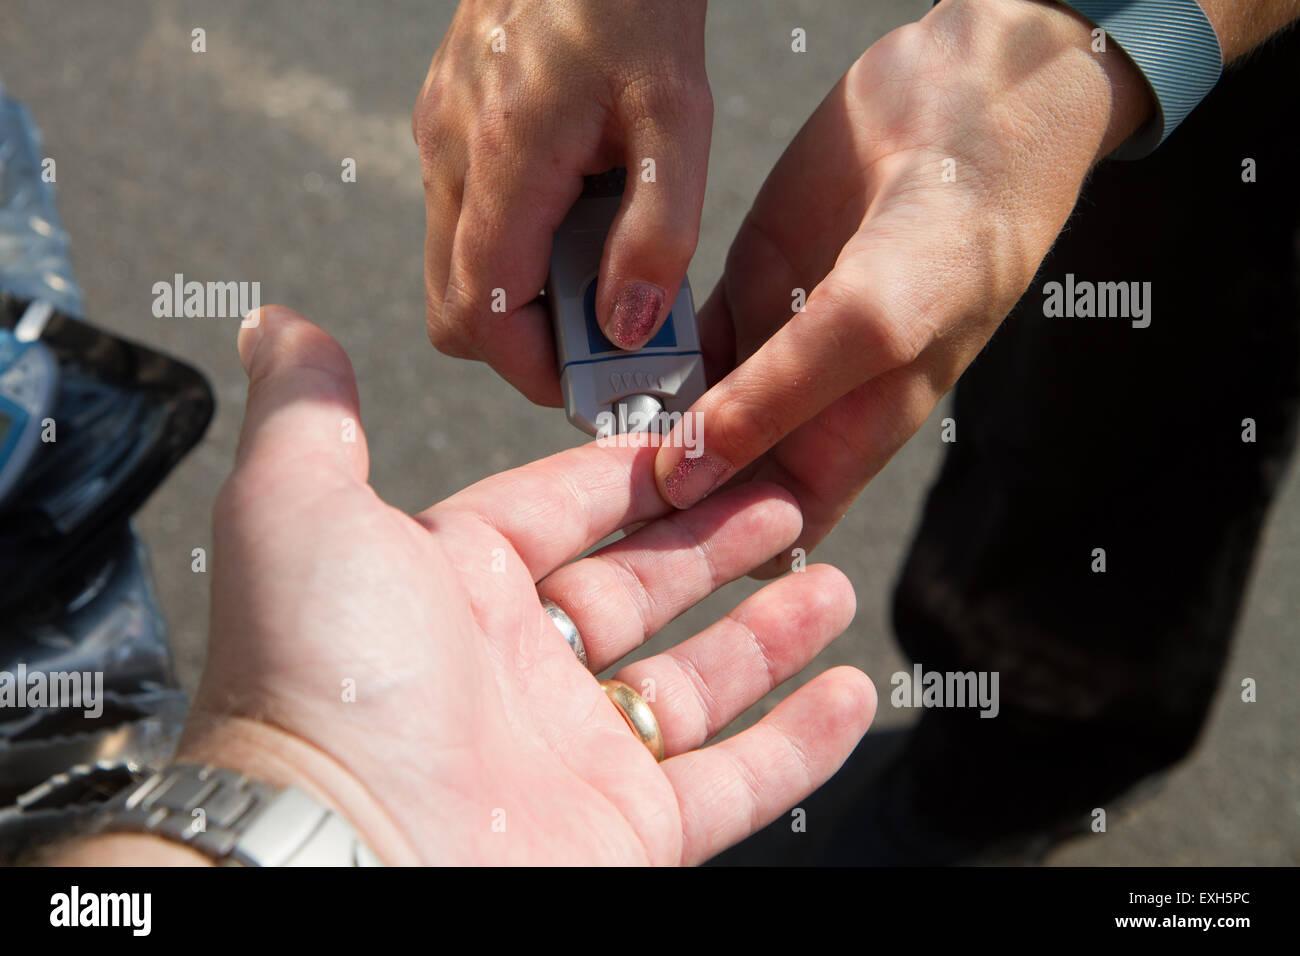 EMT / Paramedic administers blood sugar test in ambulance. - Stock Image